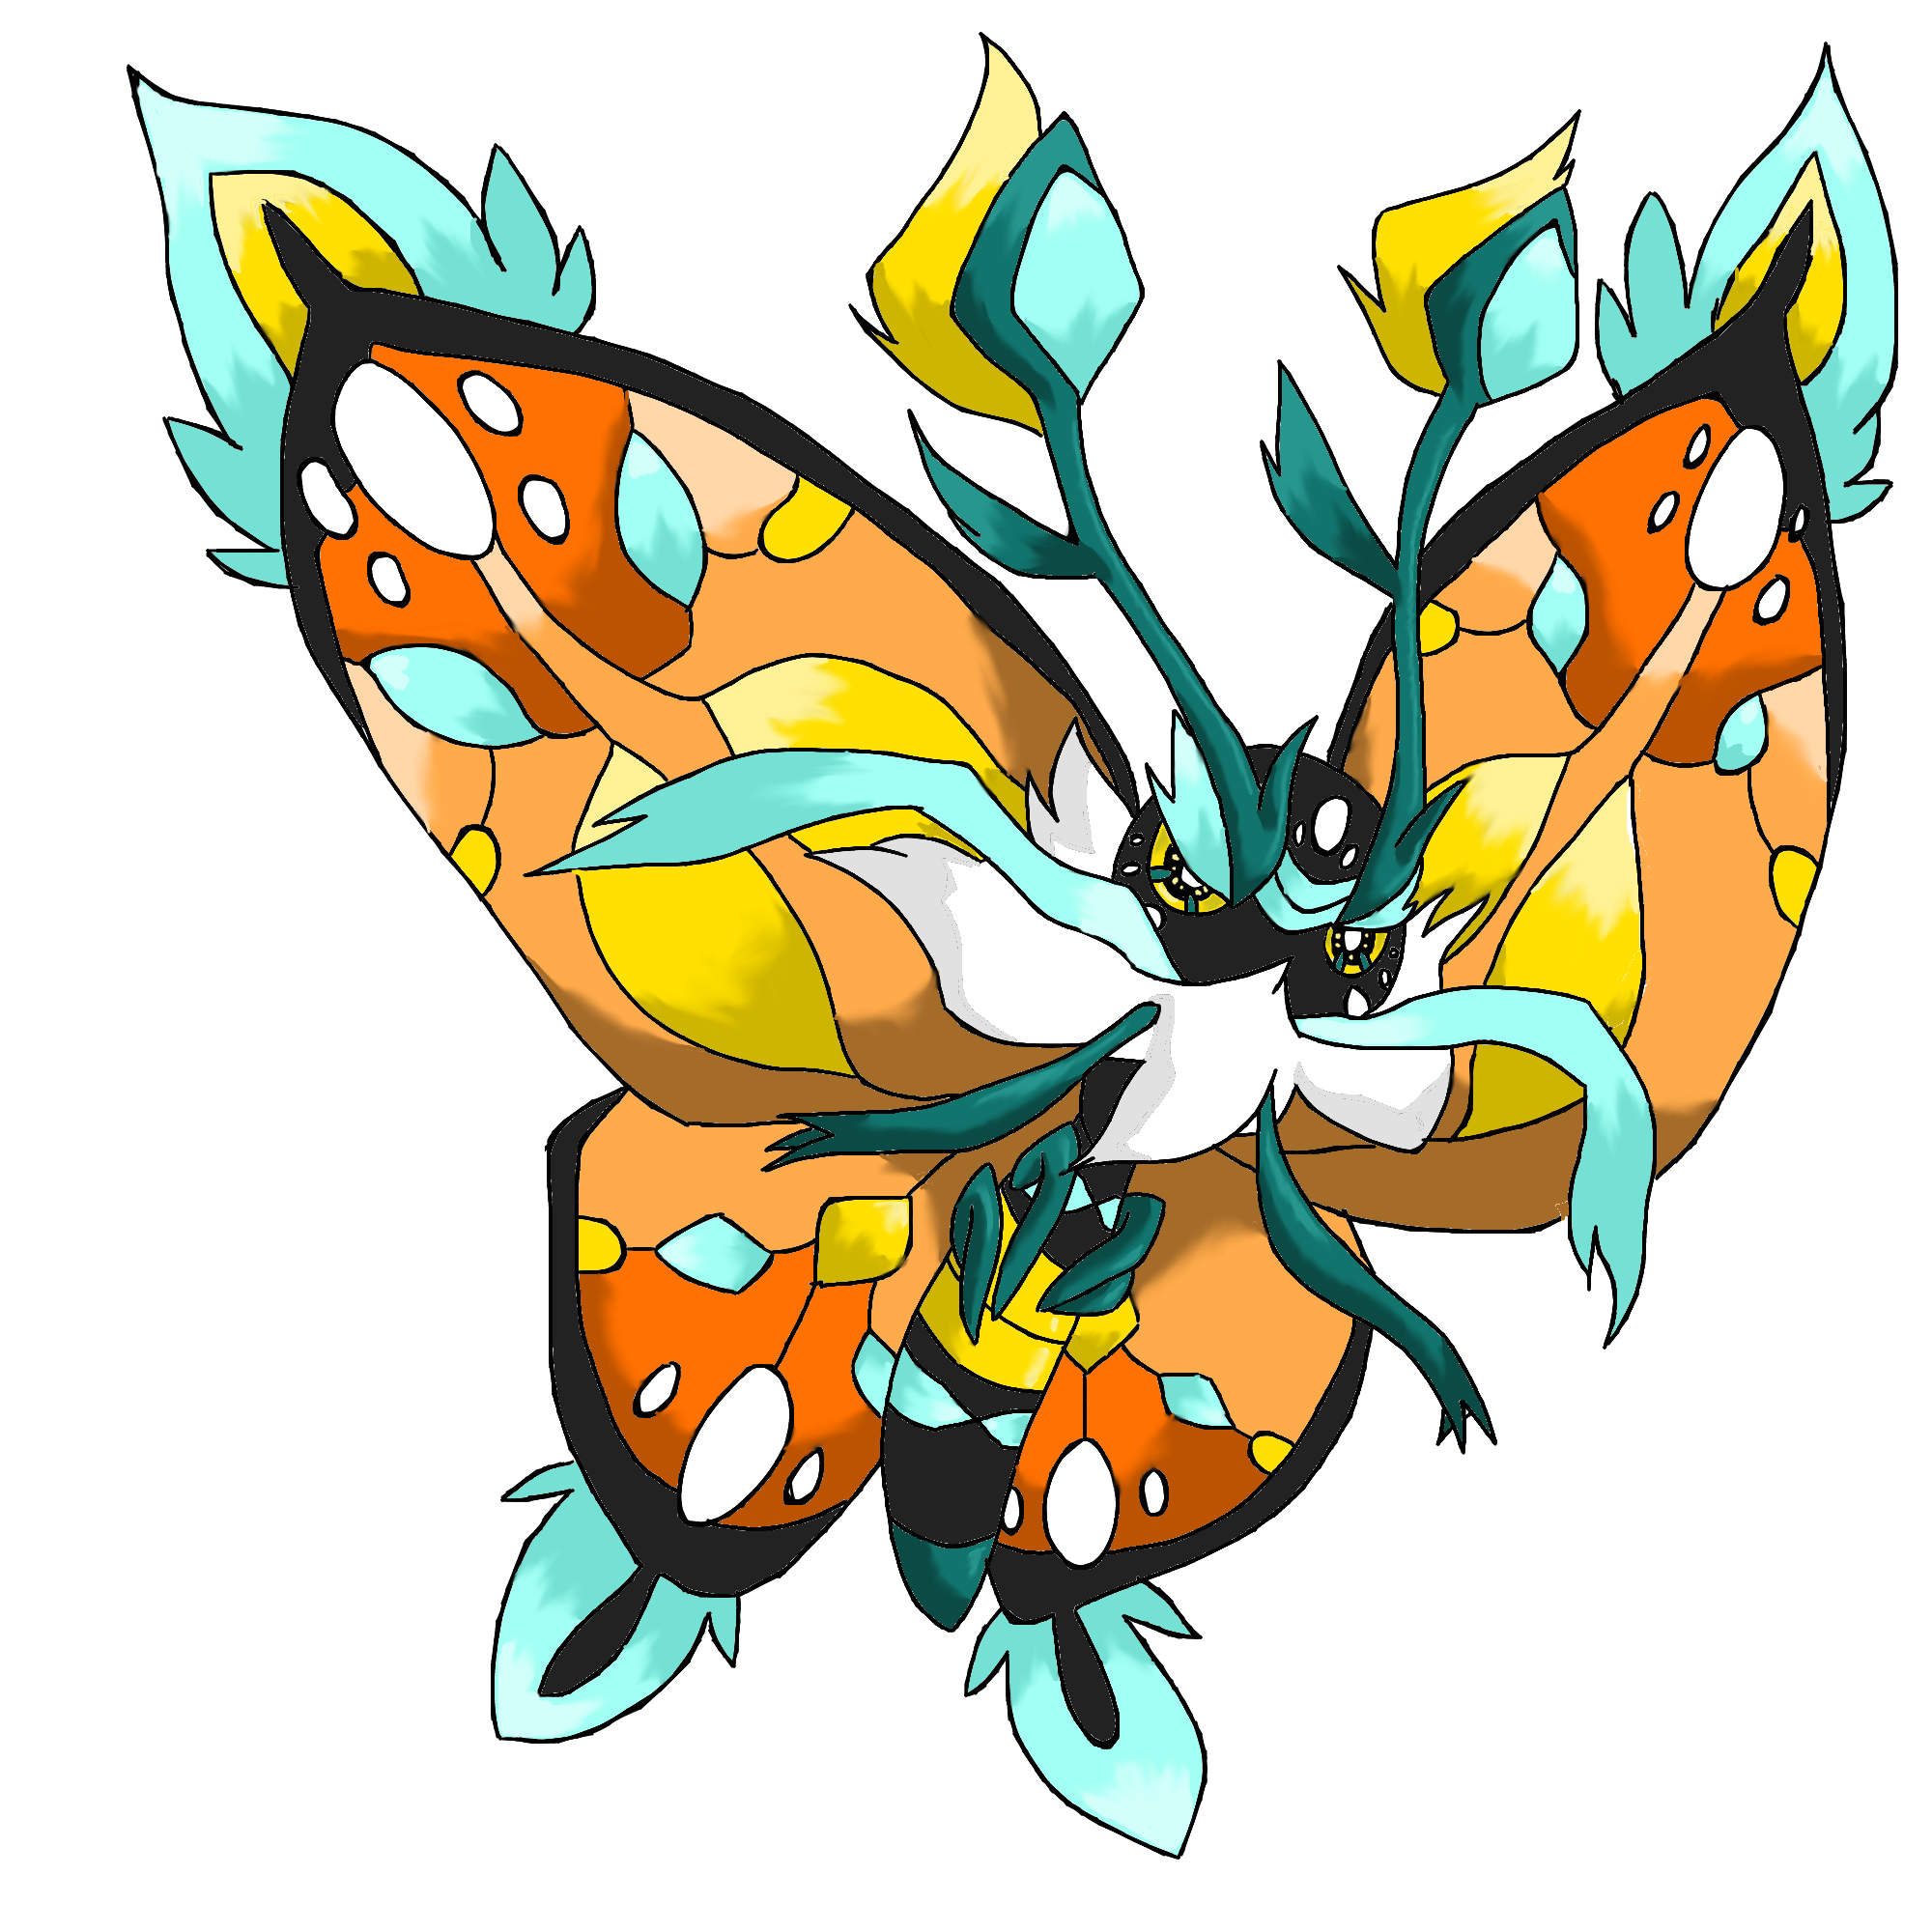 monarch butterfly legendary by toldentops on deviantart